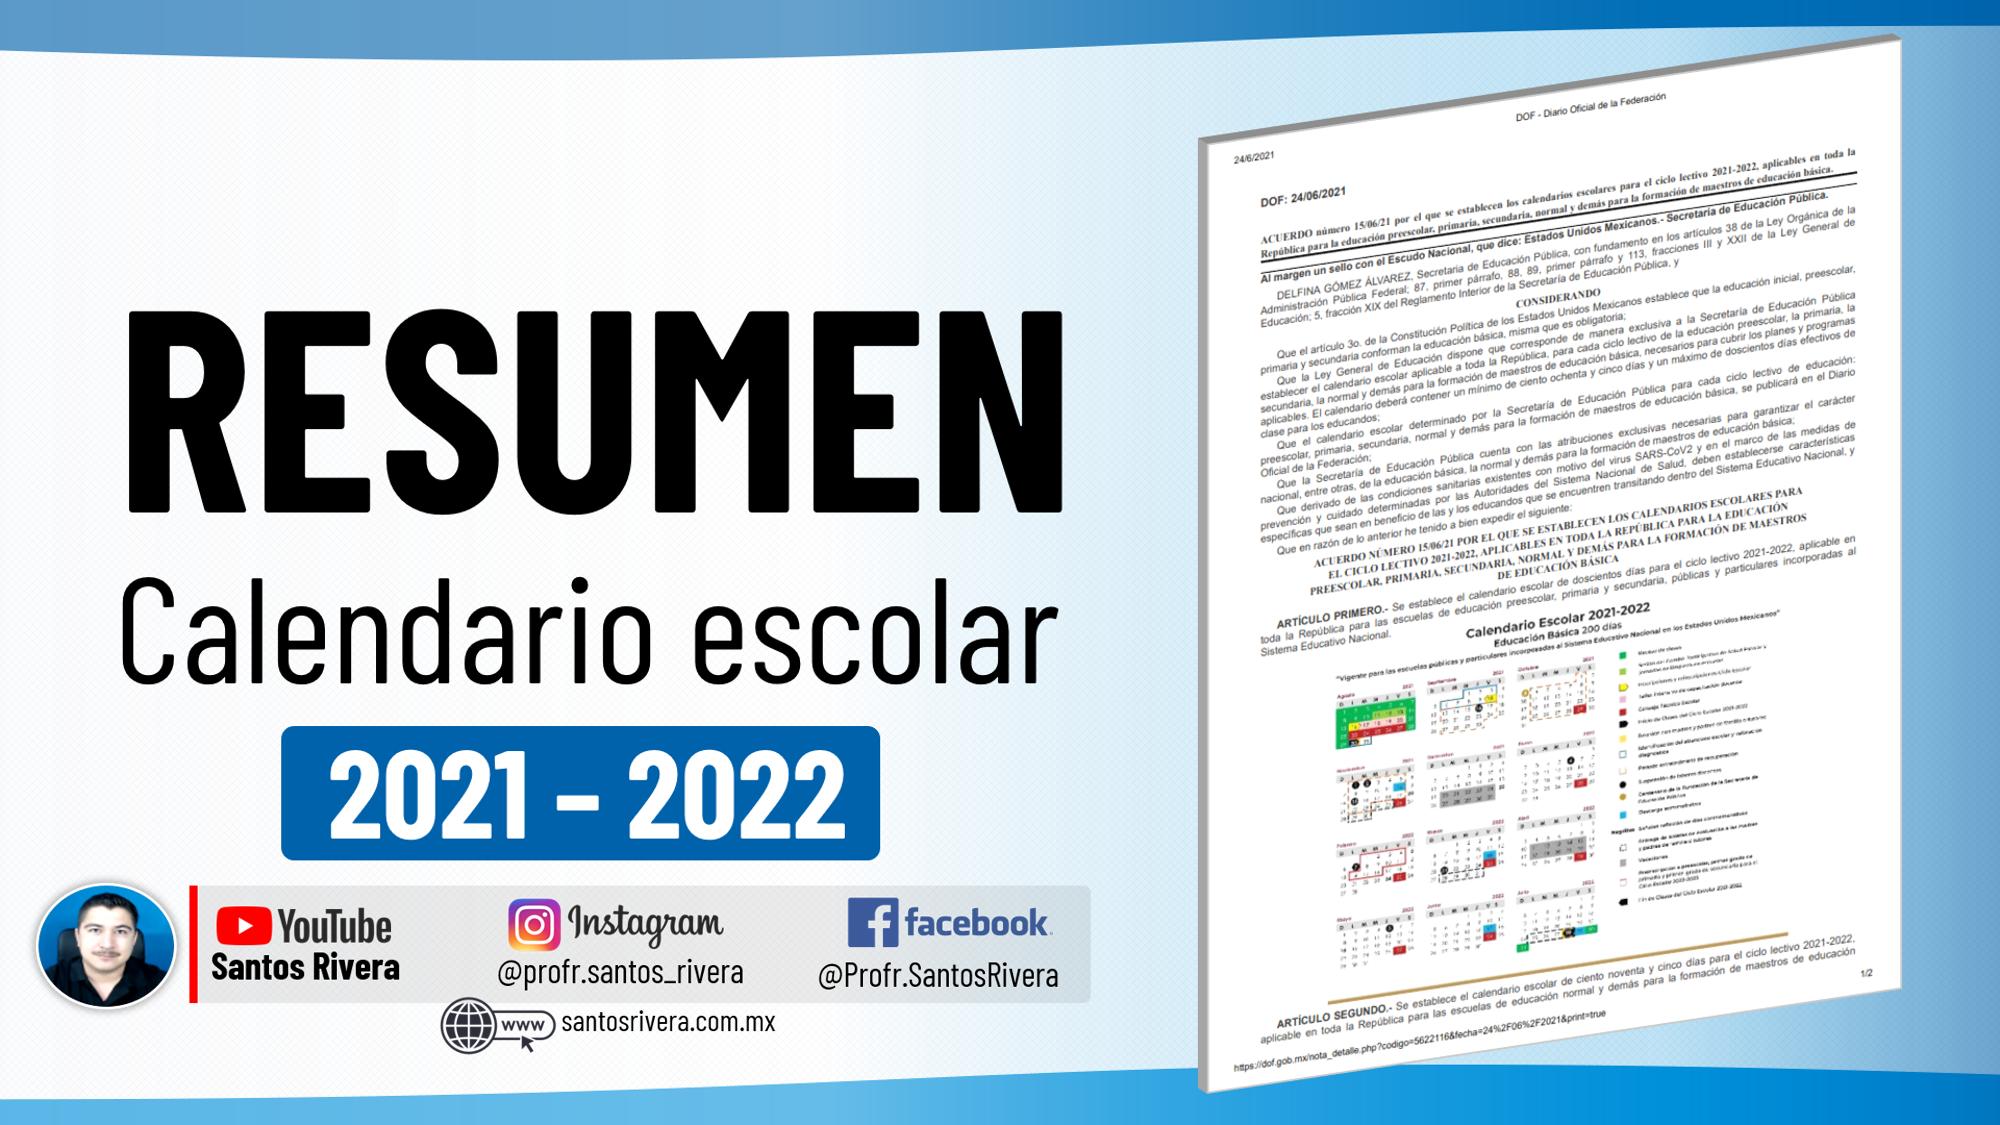 Análisis del calendario escolar 2021 - 2022